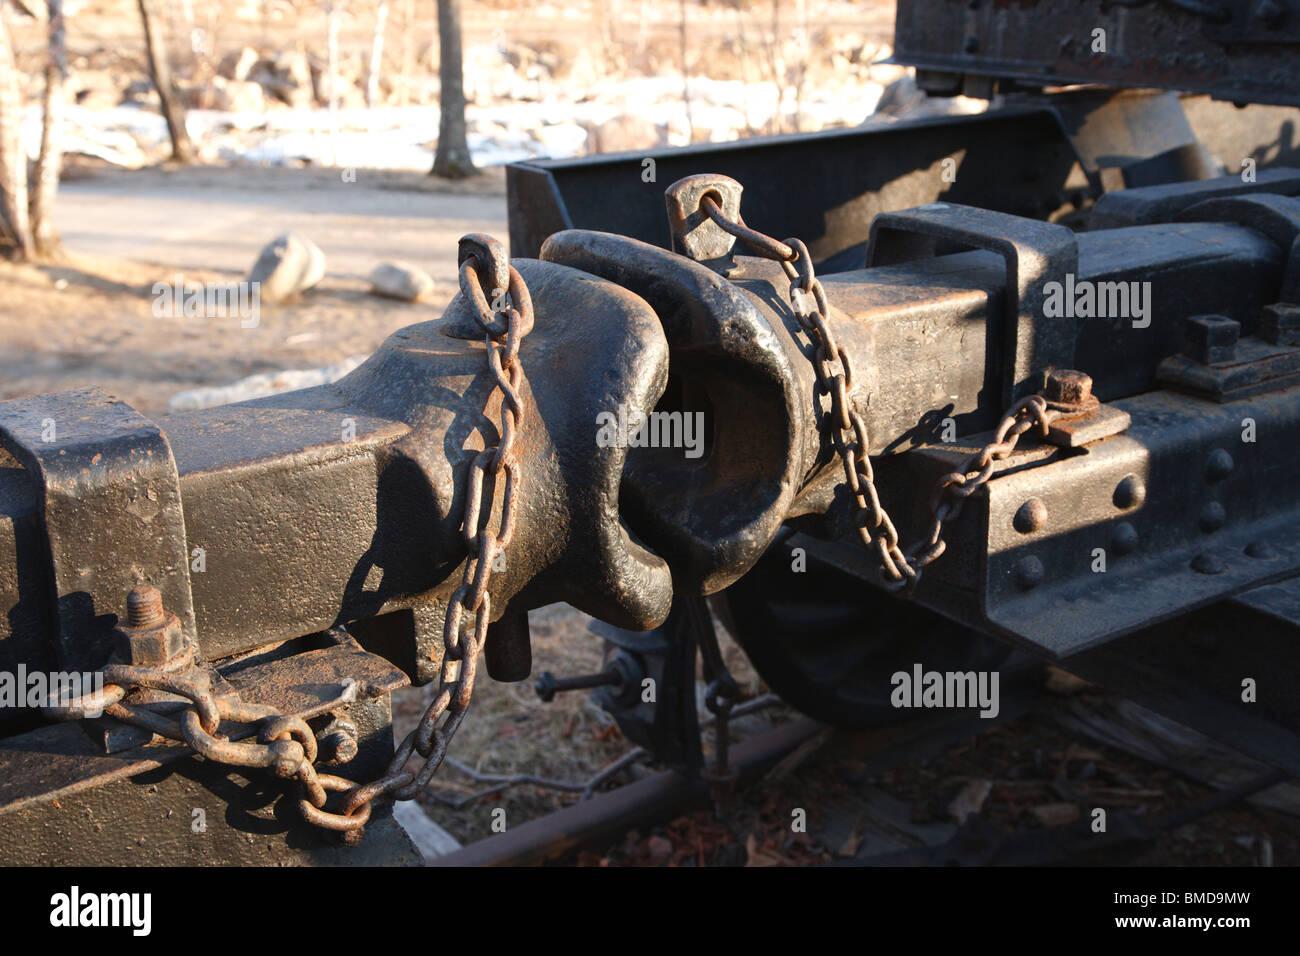 Link And Pin Coupler : Link and pin coupler of a log truck stock photo royalty